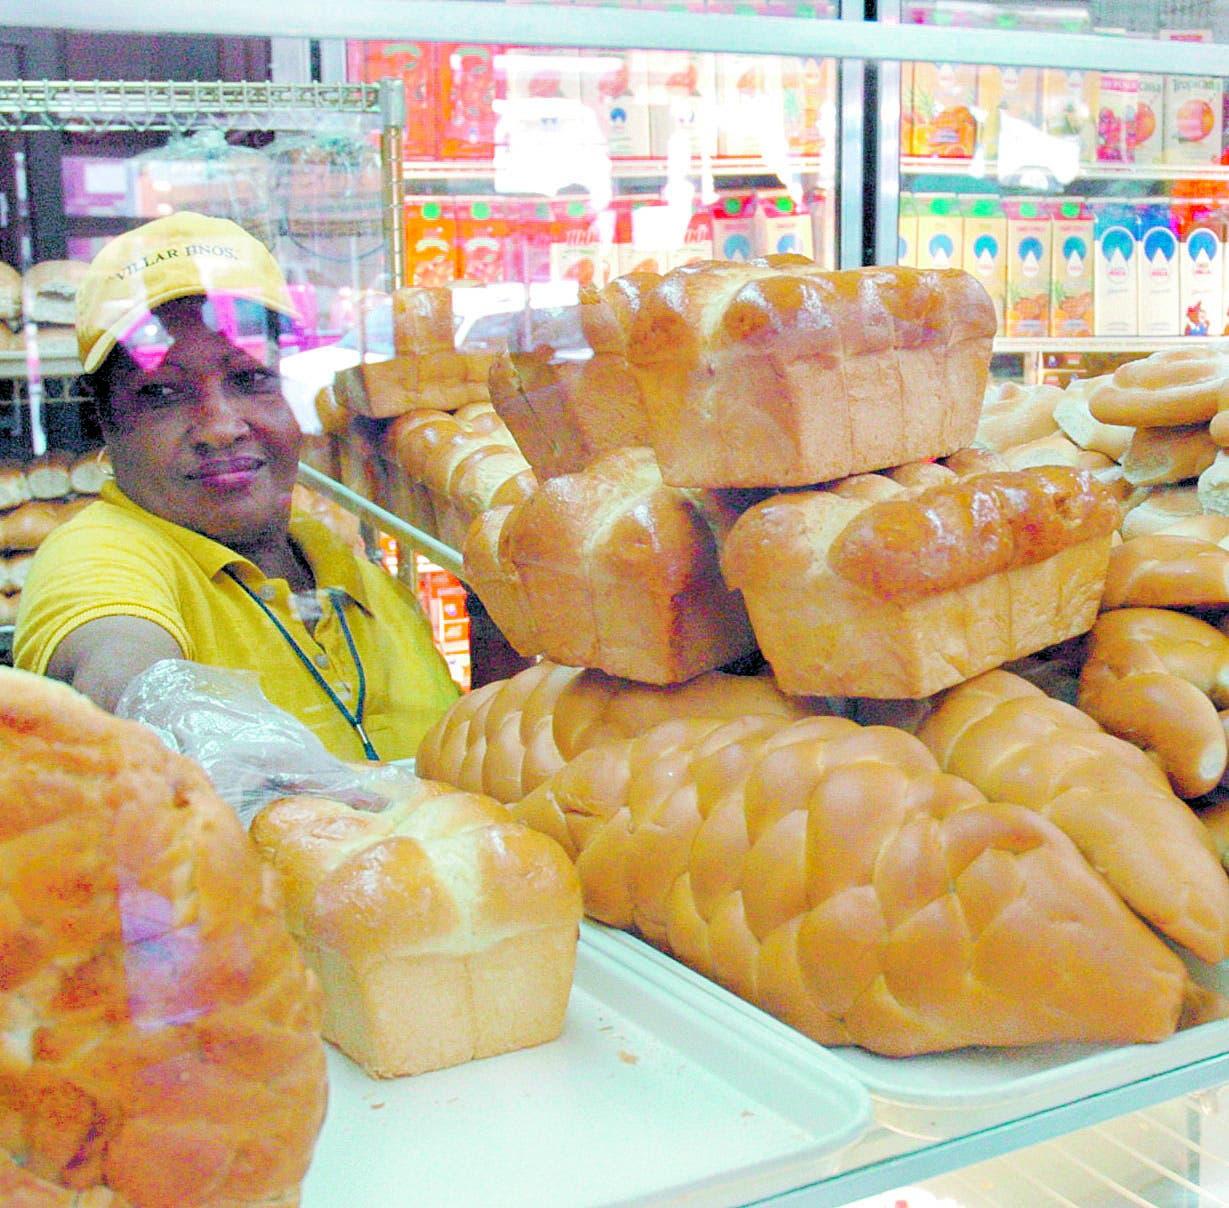 Panaderos dicen subsidios evitarán alza precio de pan